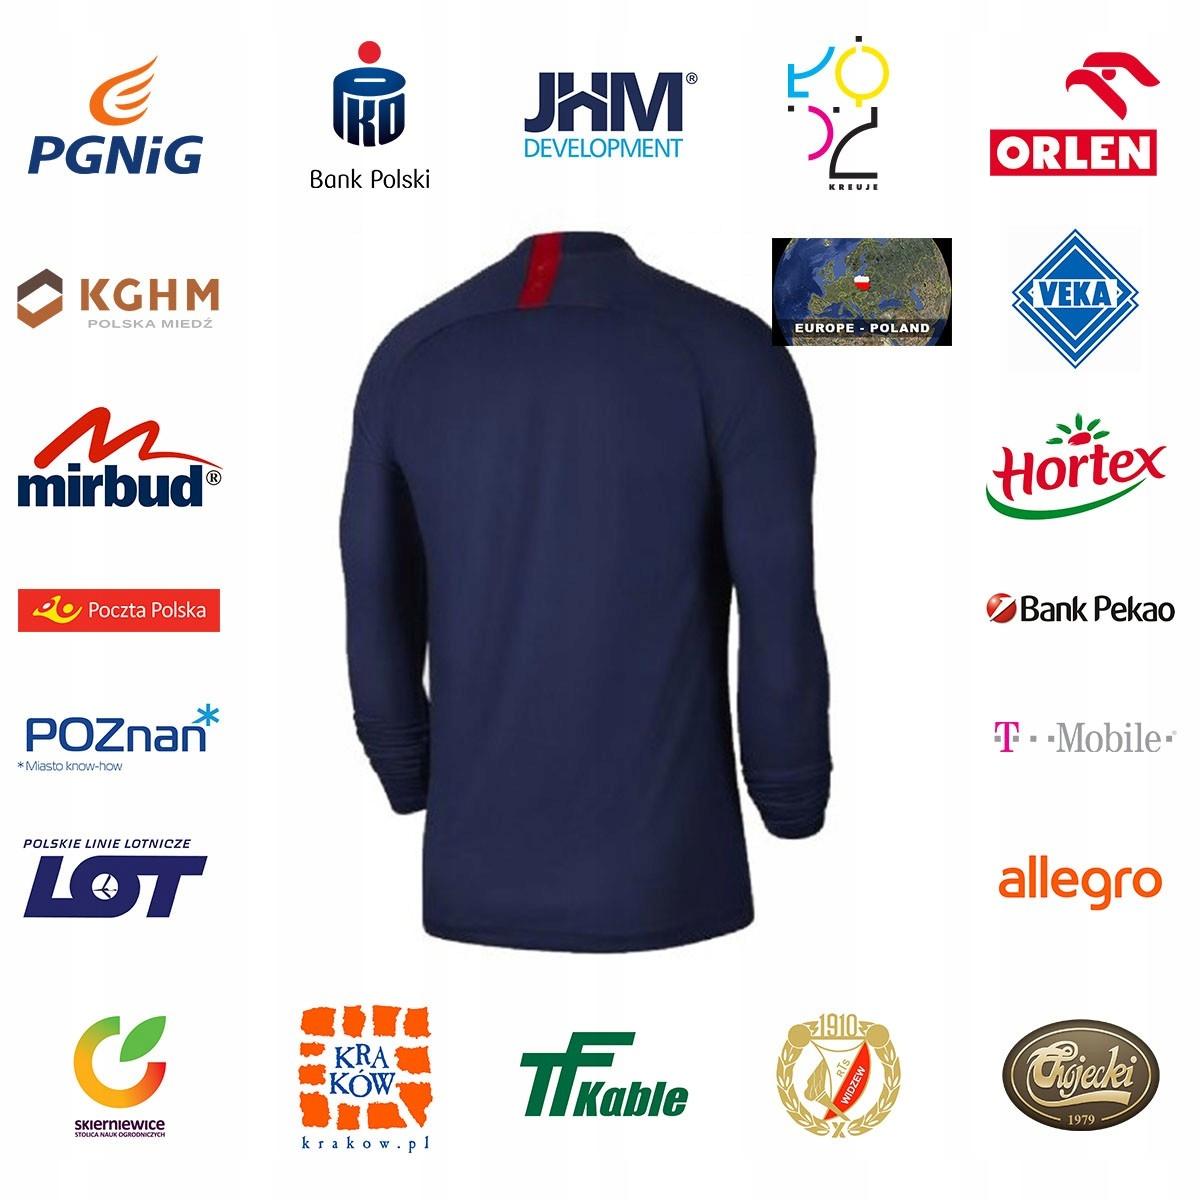 19 20 Koszulka NIKE Paris Saint Germain home XL 8586204651  zJtRj